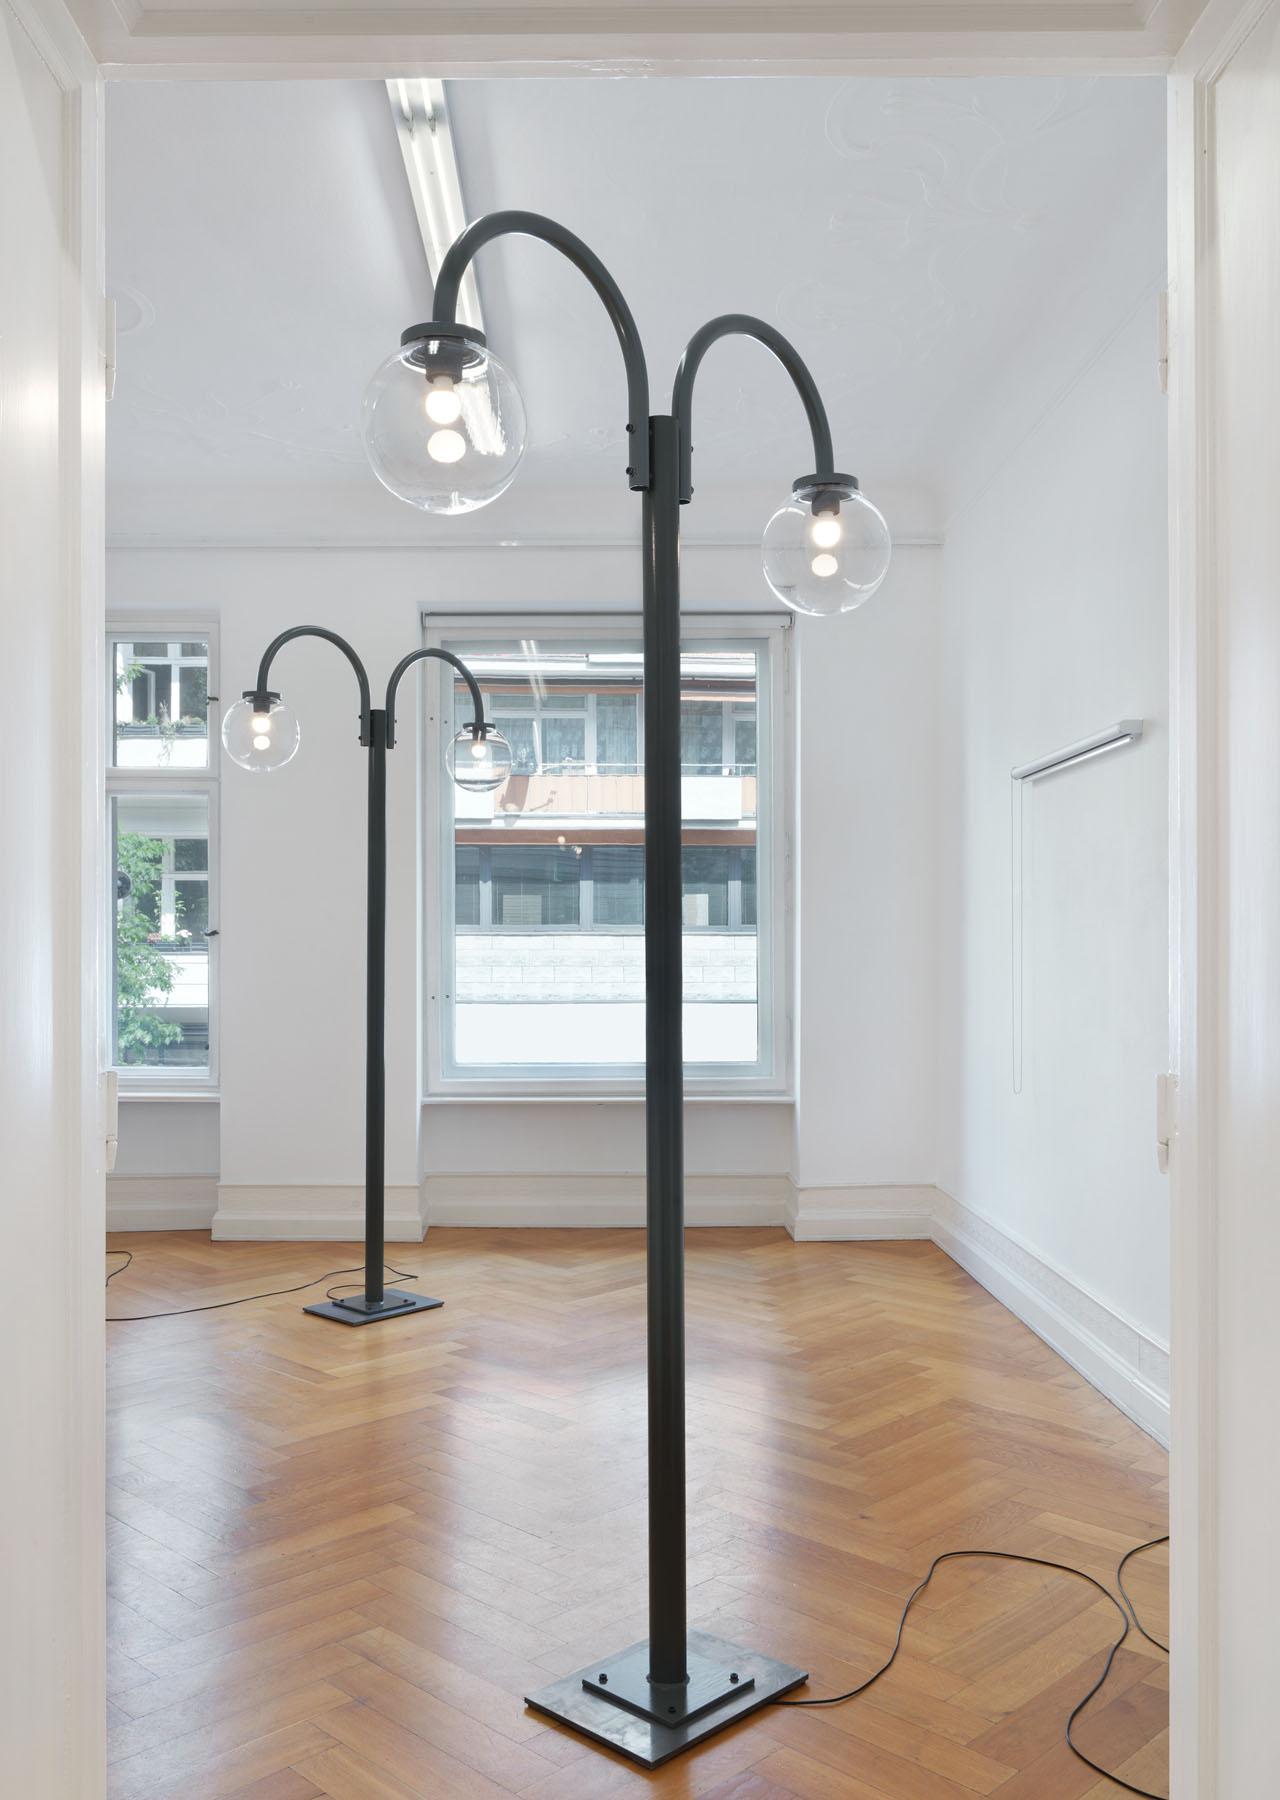 Galerie Buchholz Berlin